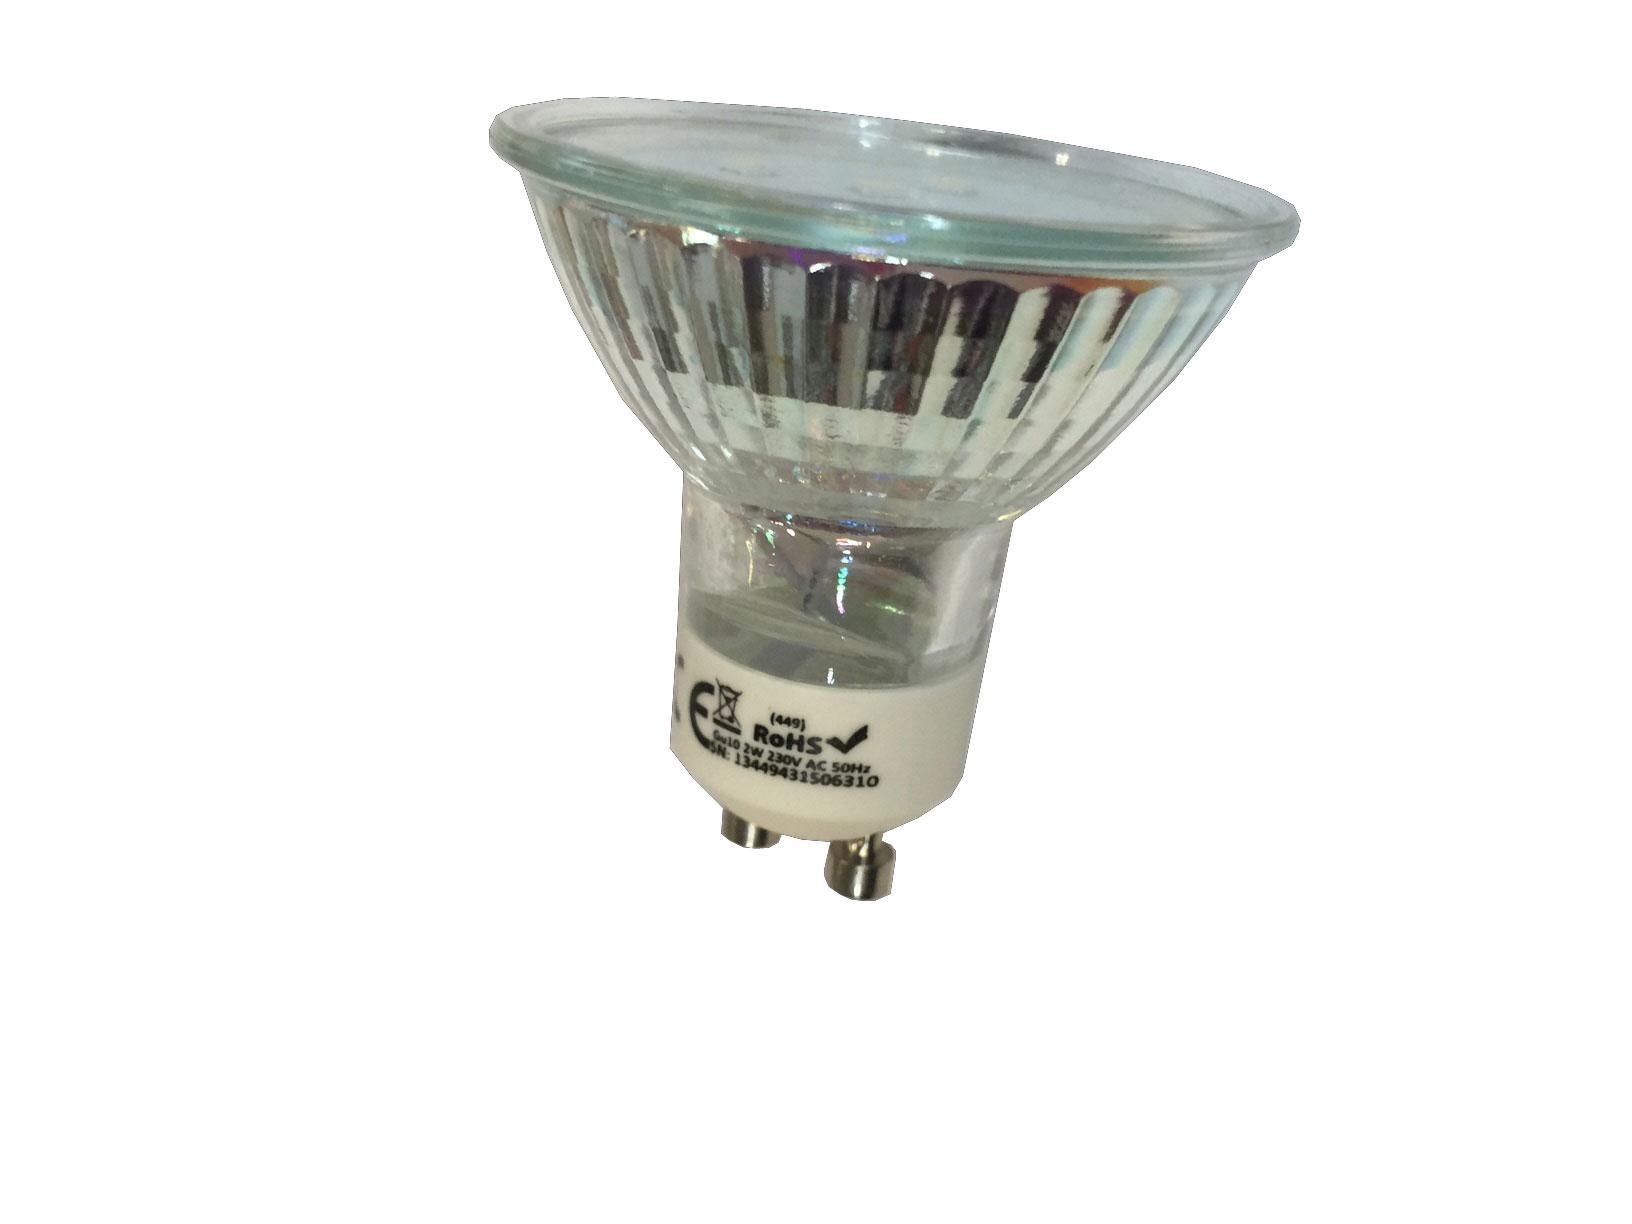 Nextec led lampe gu w ersetzt w lm k kalt weiss